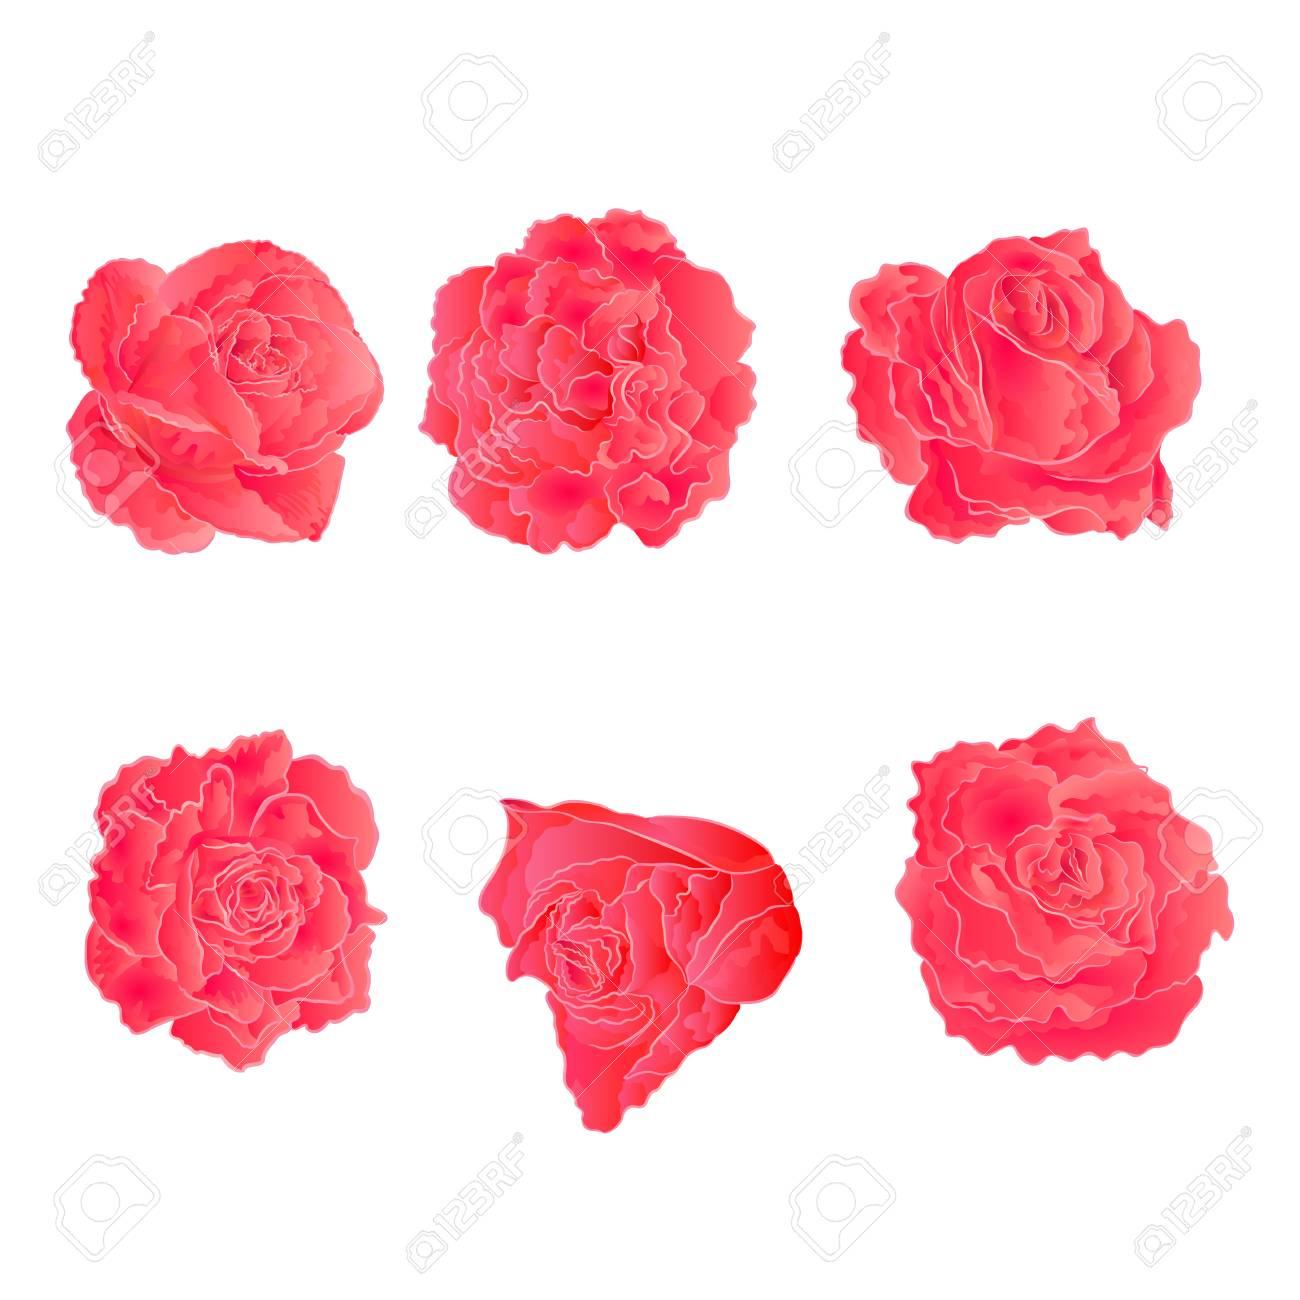 Blossom Pink Roses Symbol Of Love Vector Illustration Royalty Free